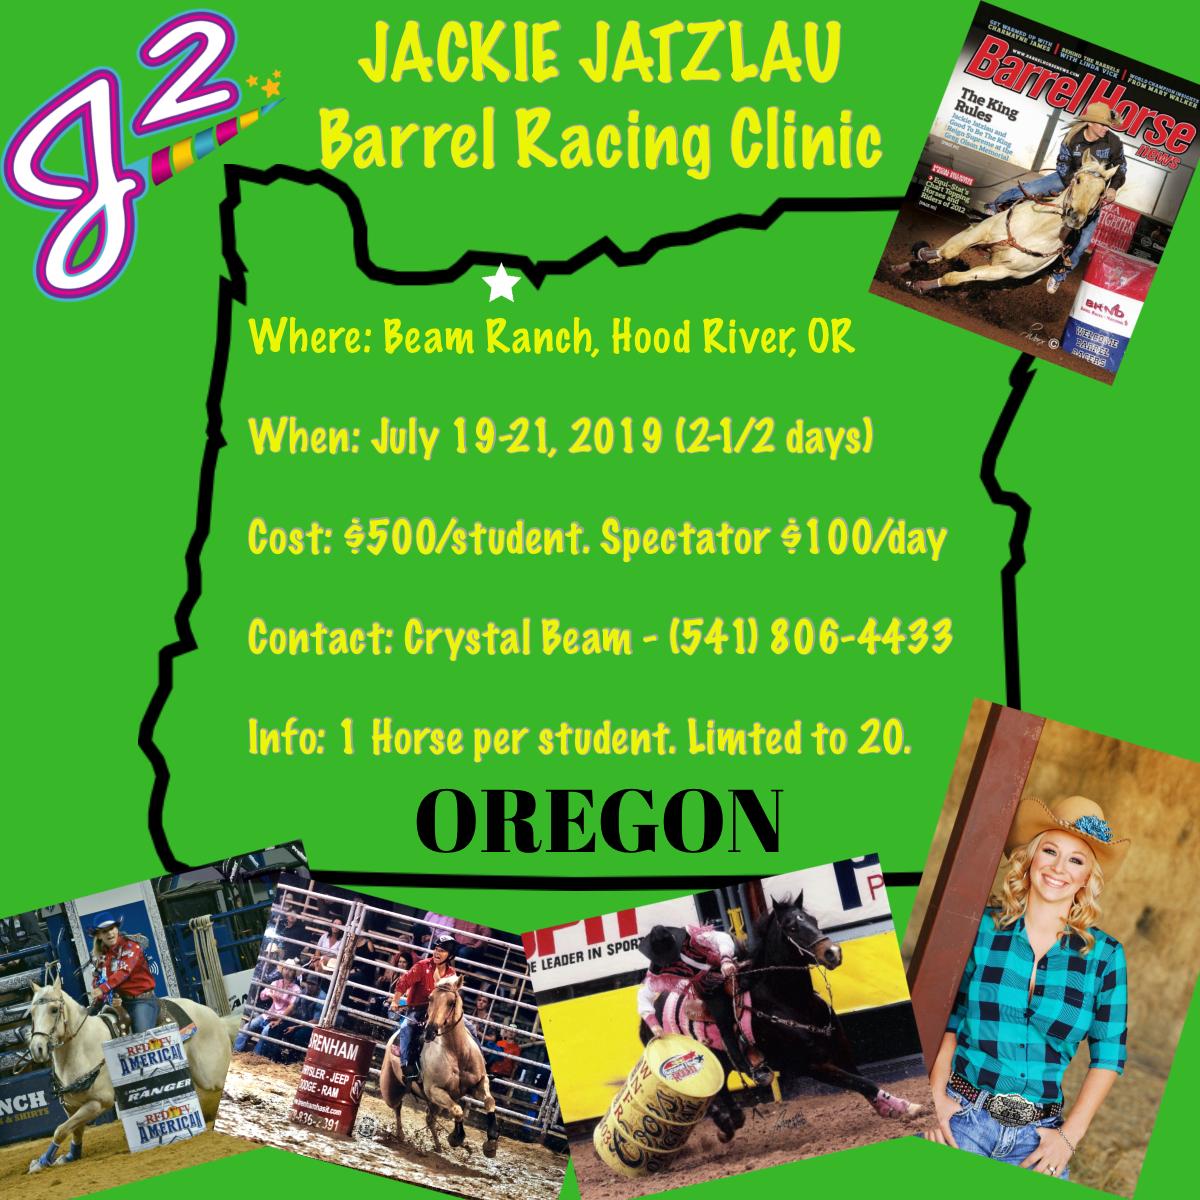 Oregon Clinic Announcement.jpg